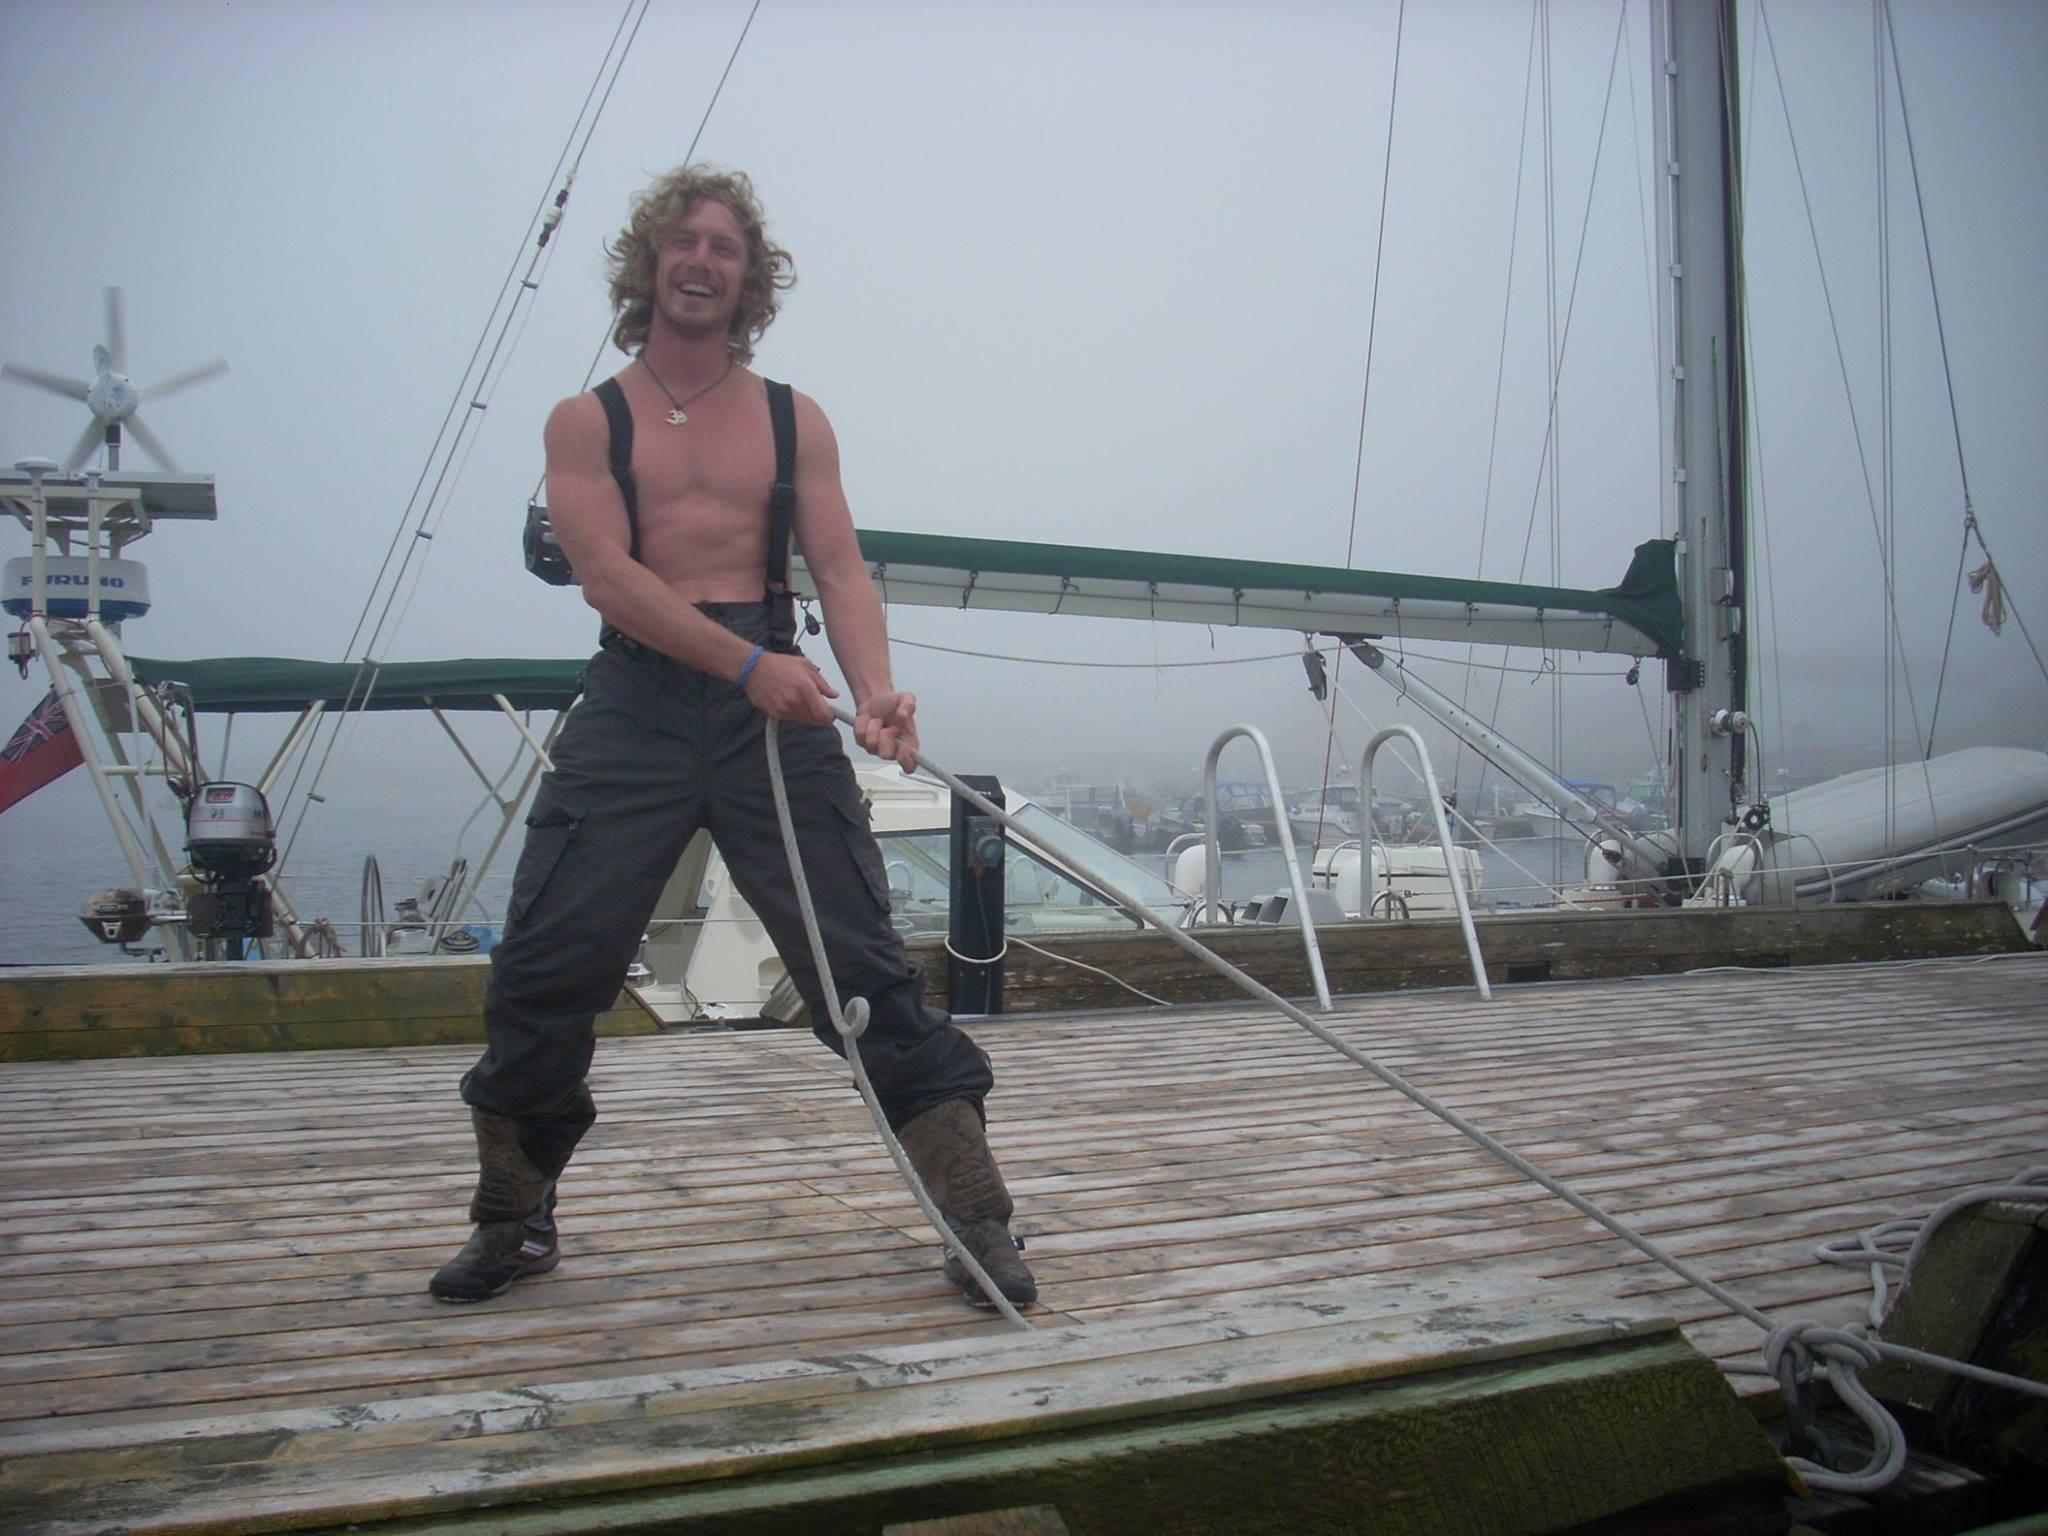 Clint helping tie the docklines on Arcturus in St. Pierre in 2011, en route across the Atlantic.